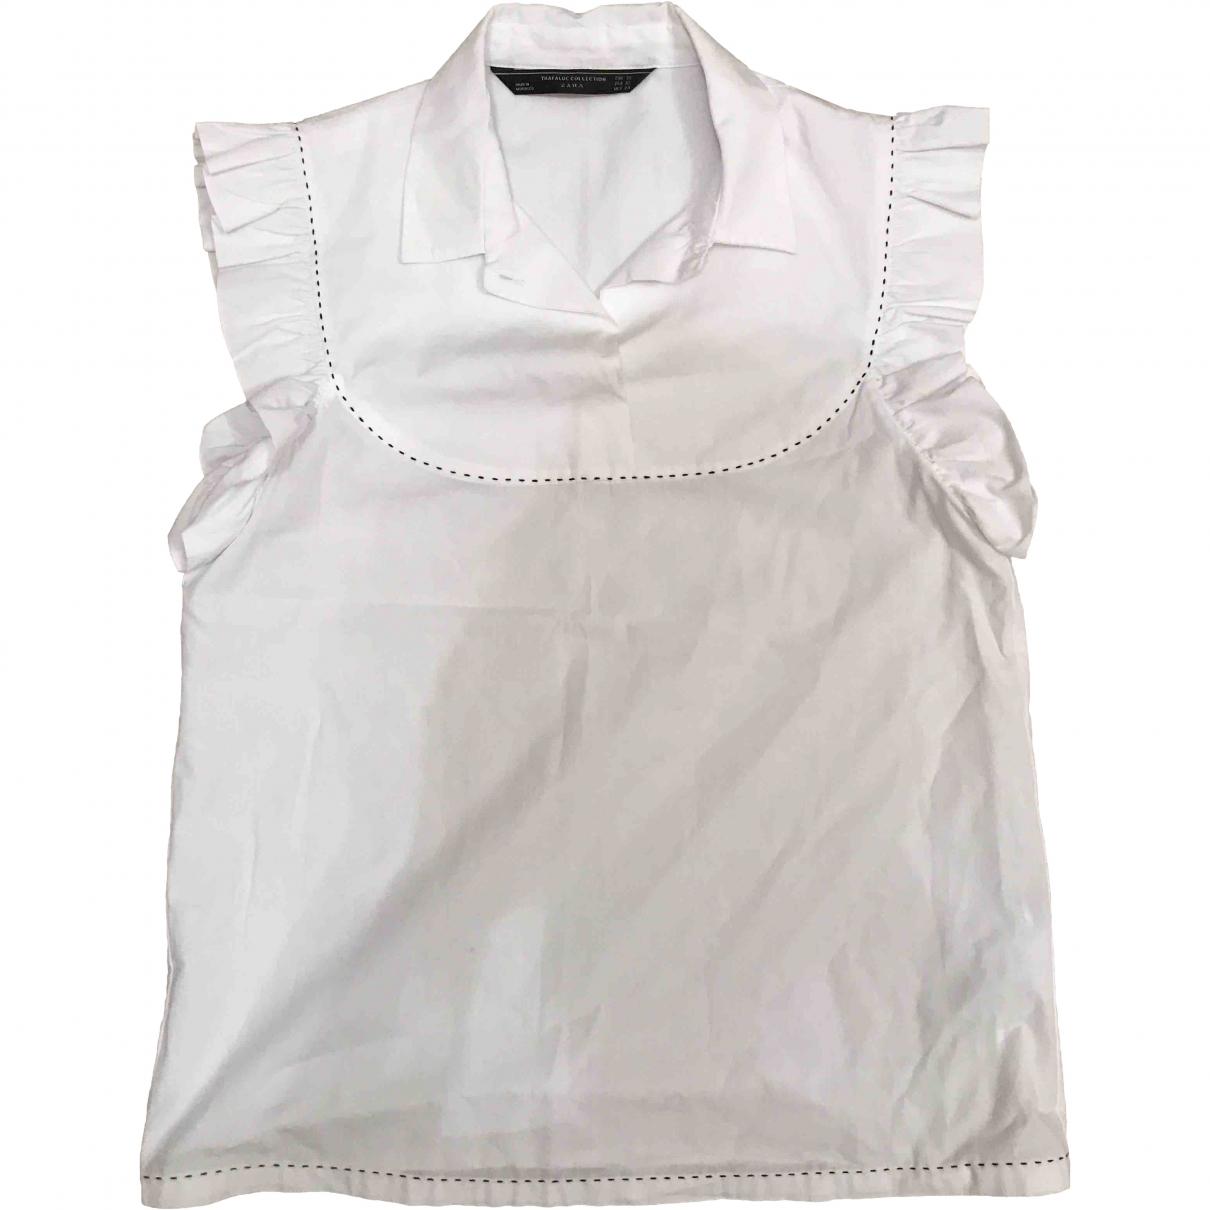 Zara \N White Cotton  top for Women XS International